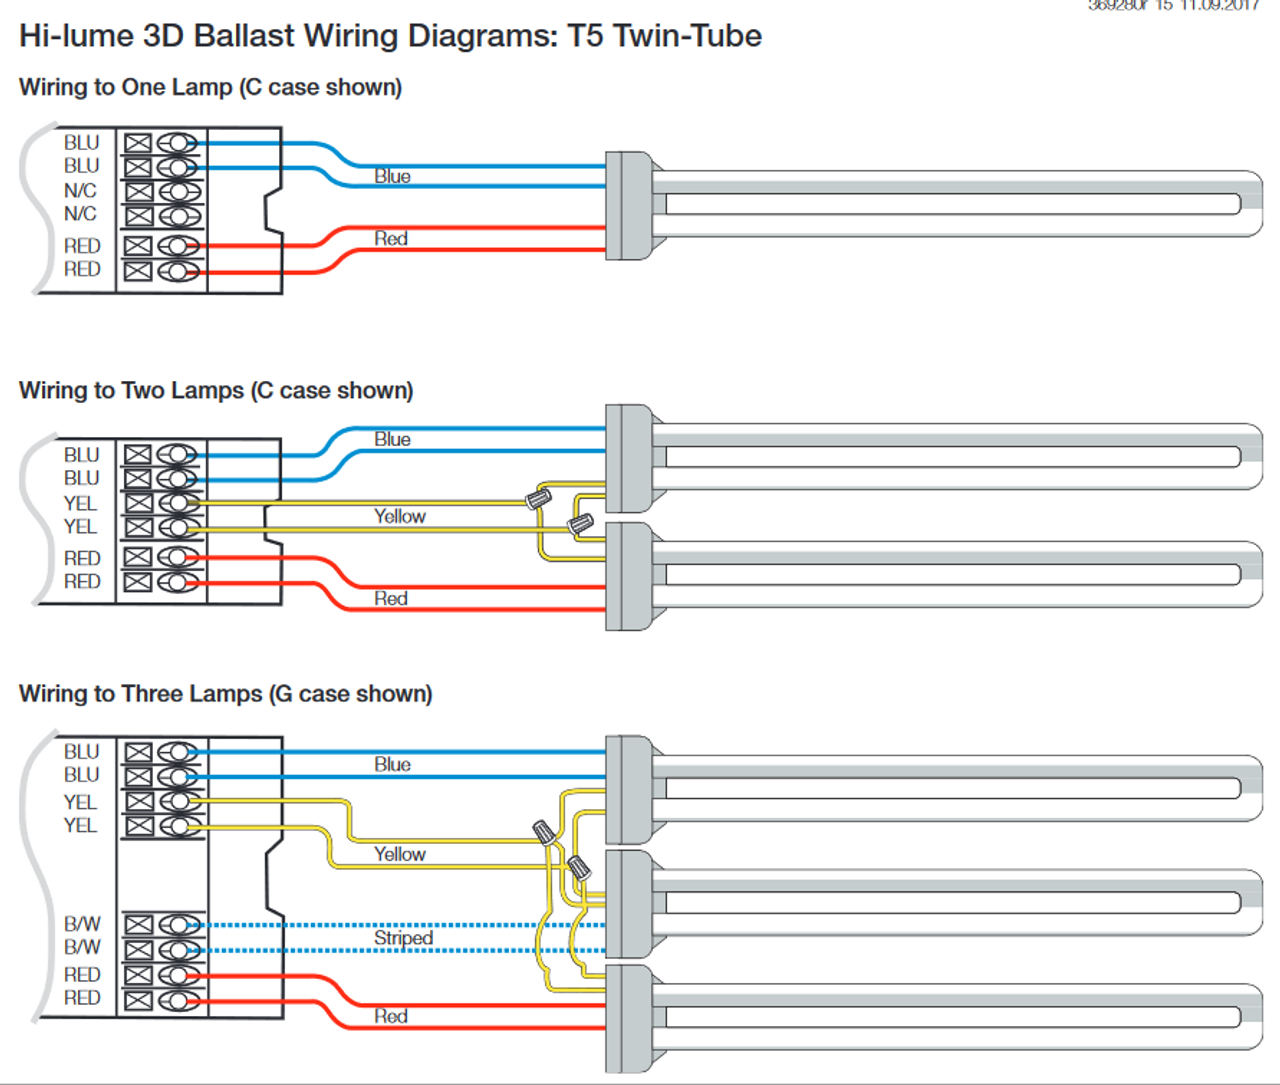 H3DT540GU210 (replaces EC3T540GU210) Lutron Electronic ...